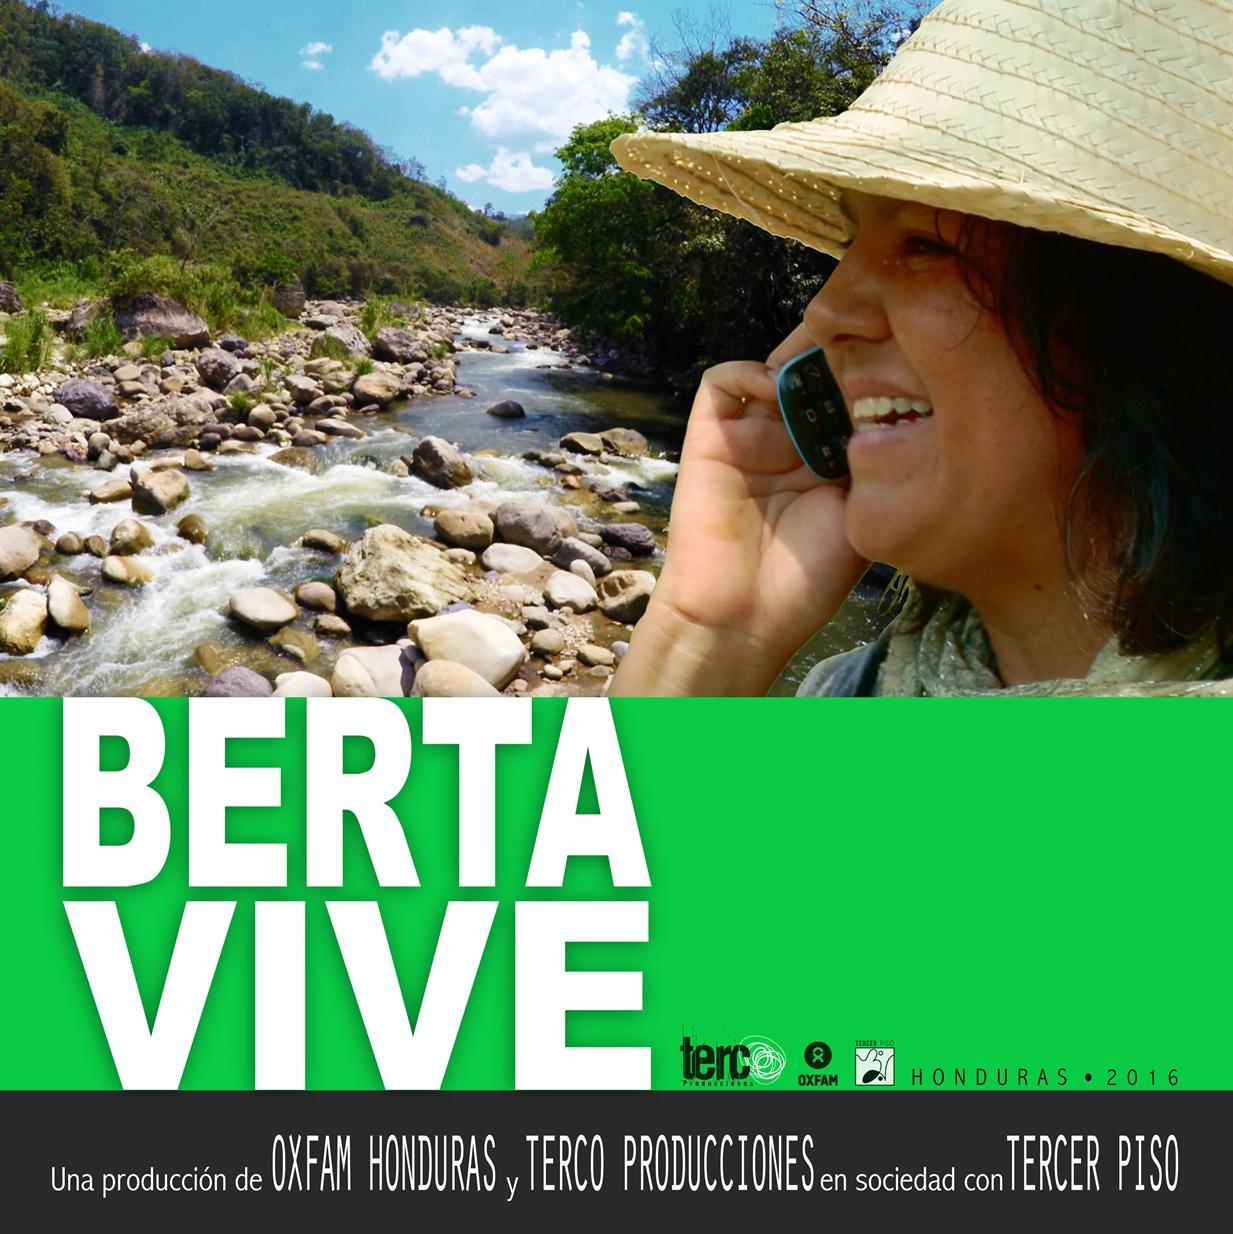 BERTA VIVE cartel R.jpg